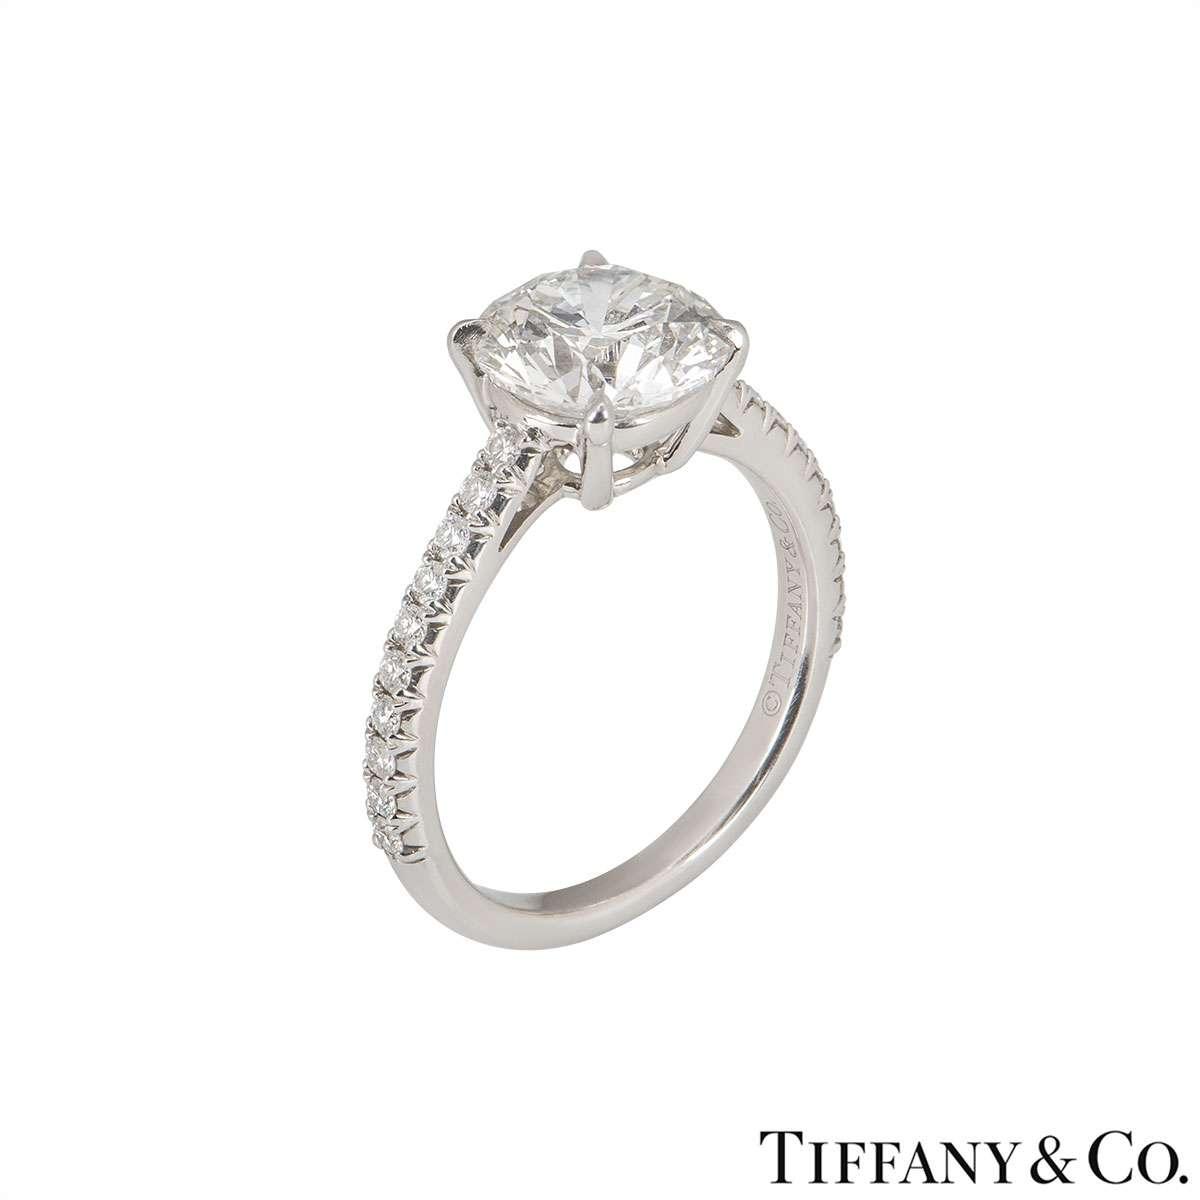 Tiffany & Co. Platinum Diamond Novo Ring 1.72ct G/VS1 XXX